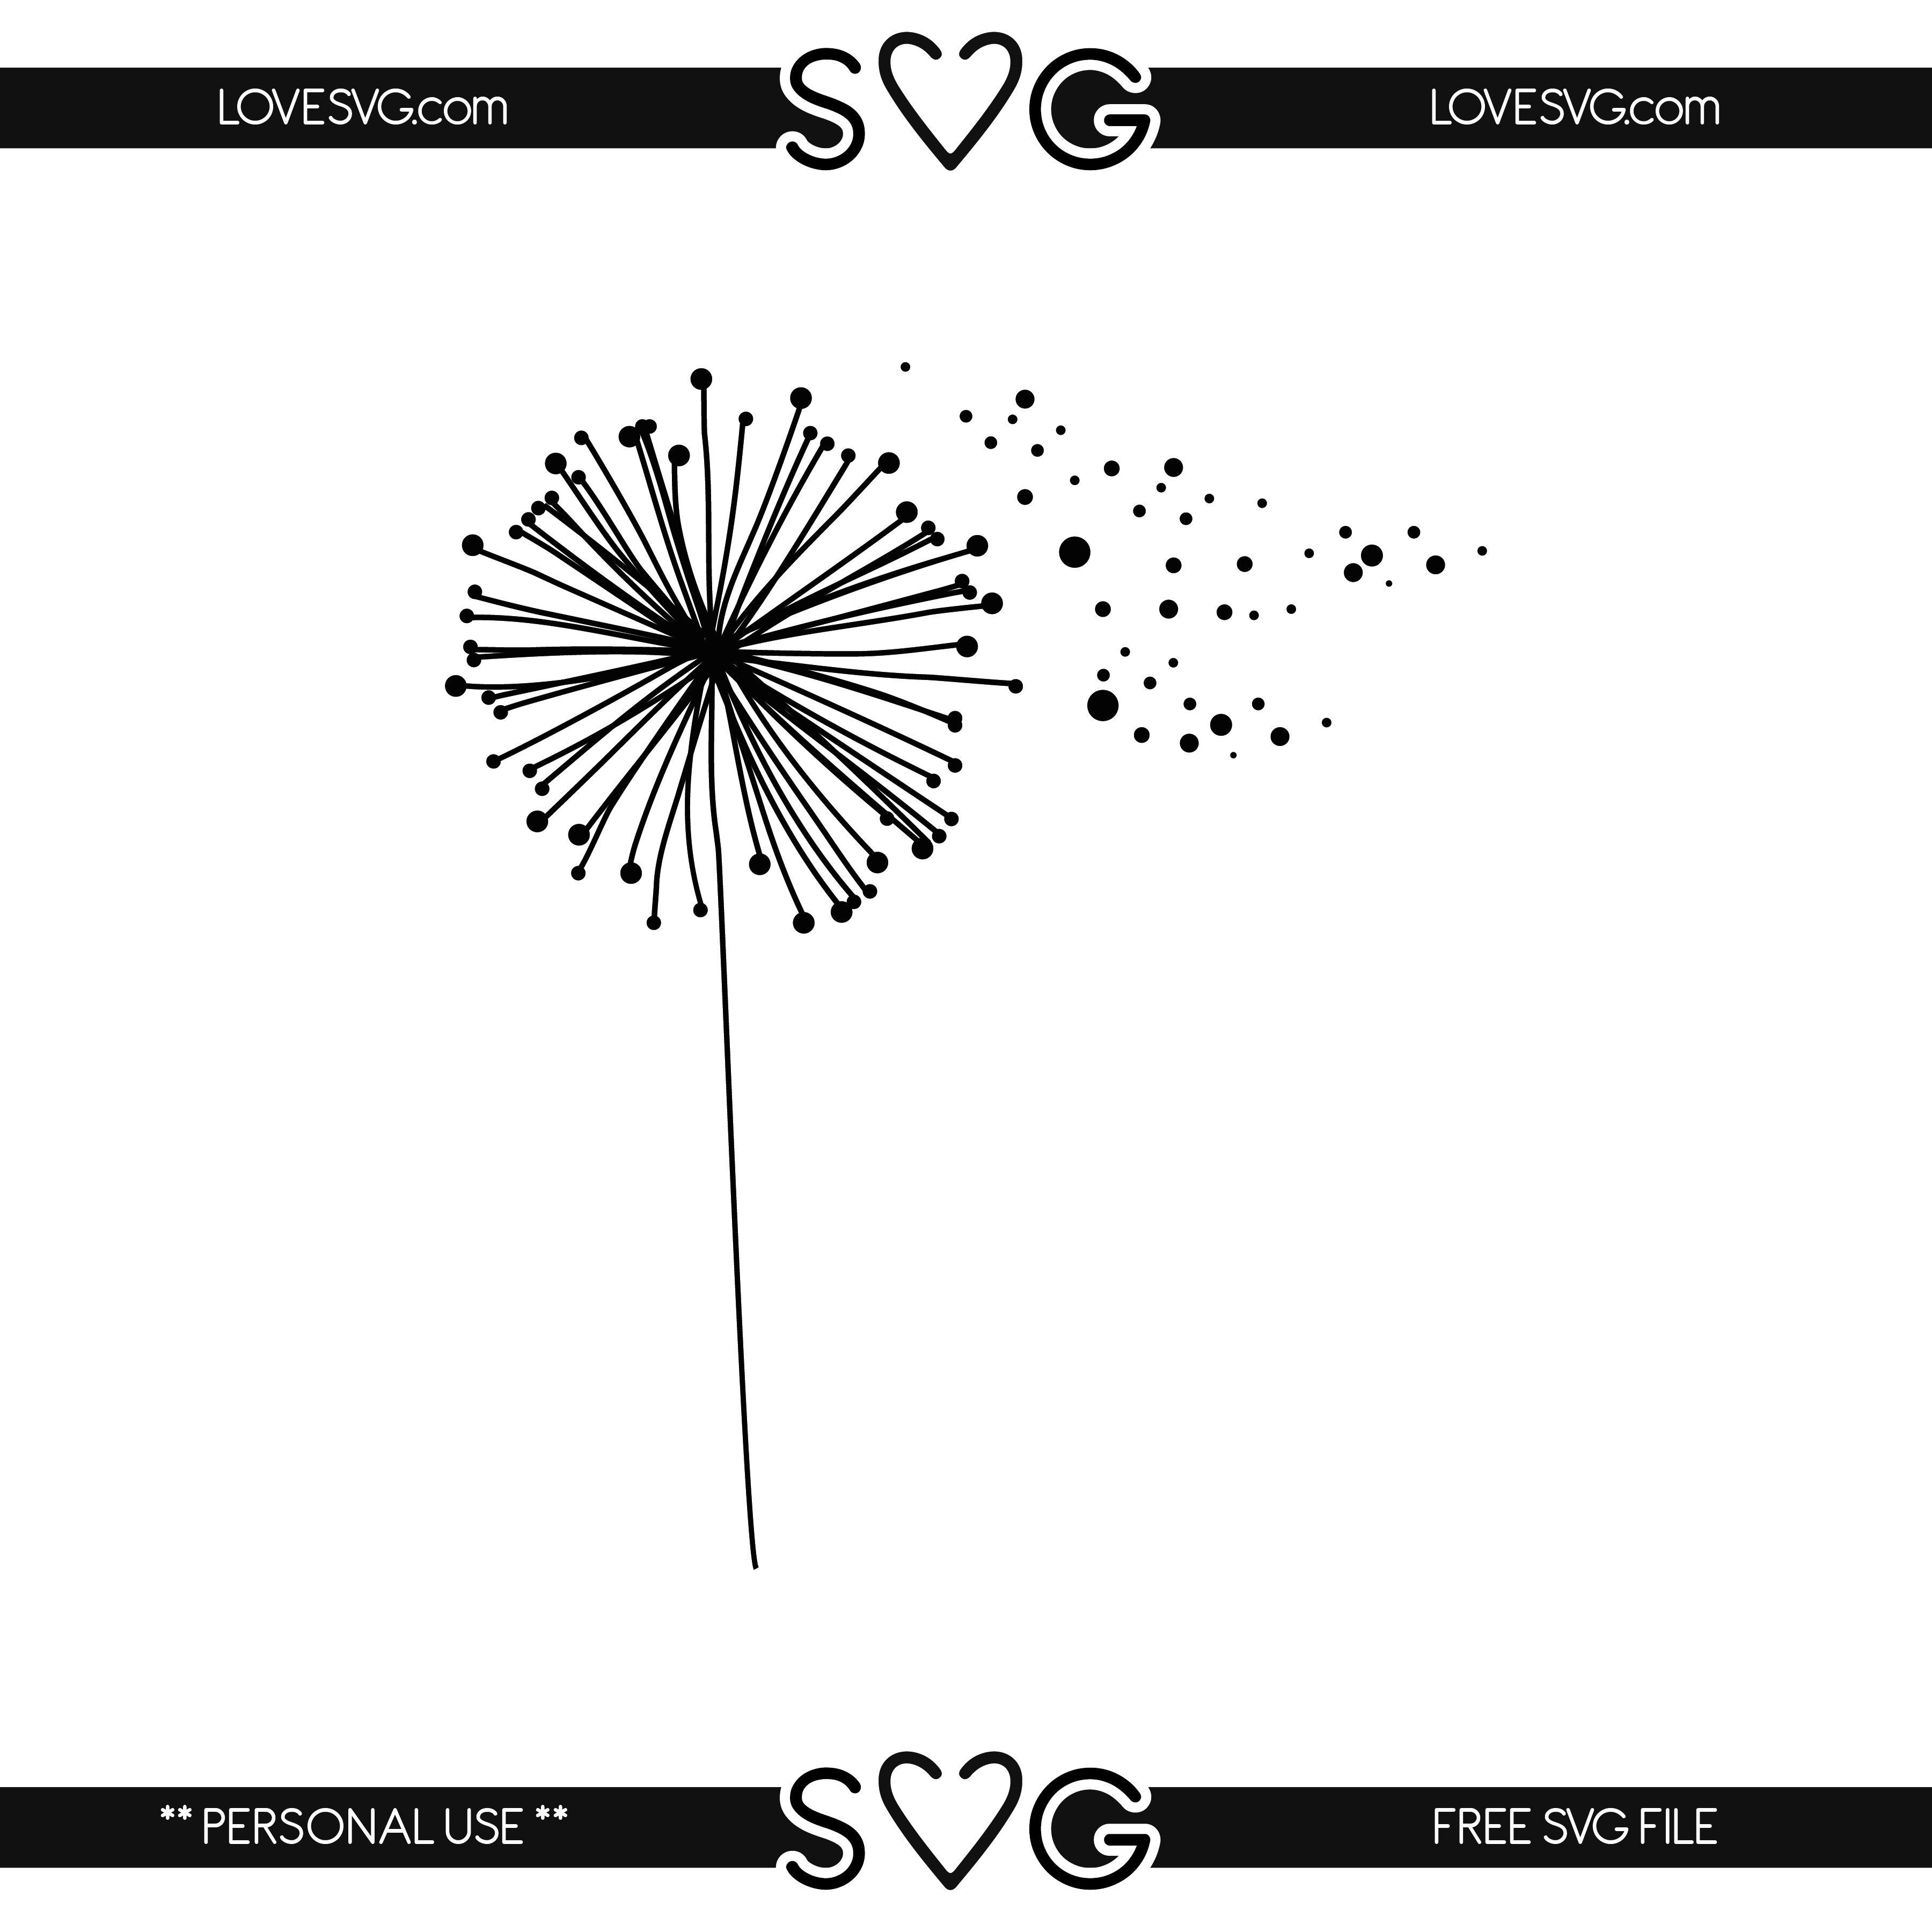 Free svg files Dandelion Cricut design, Cricut vinyl